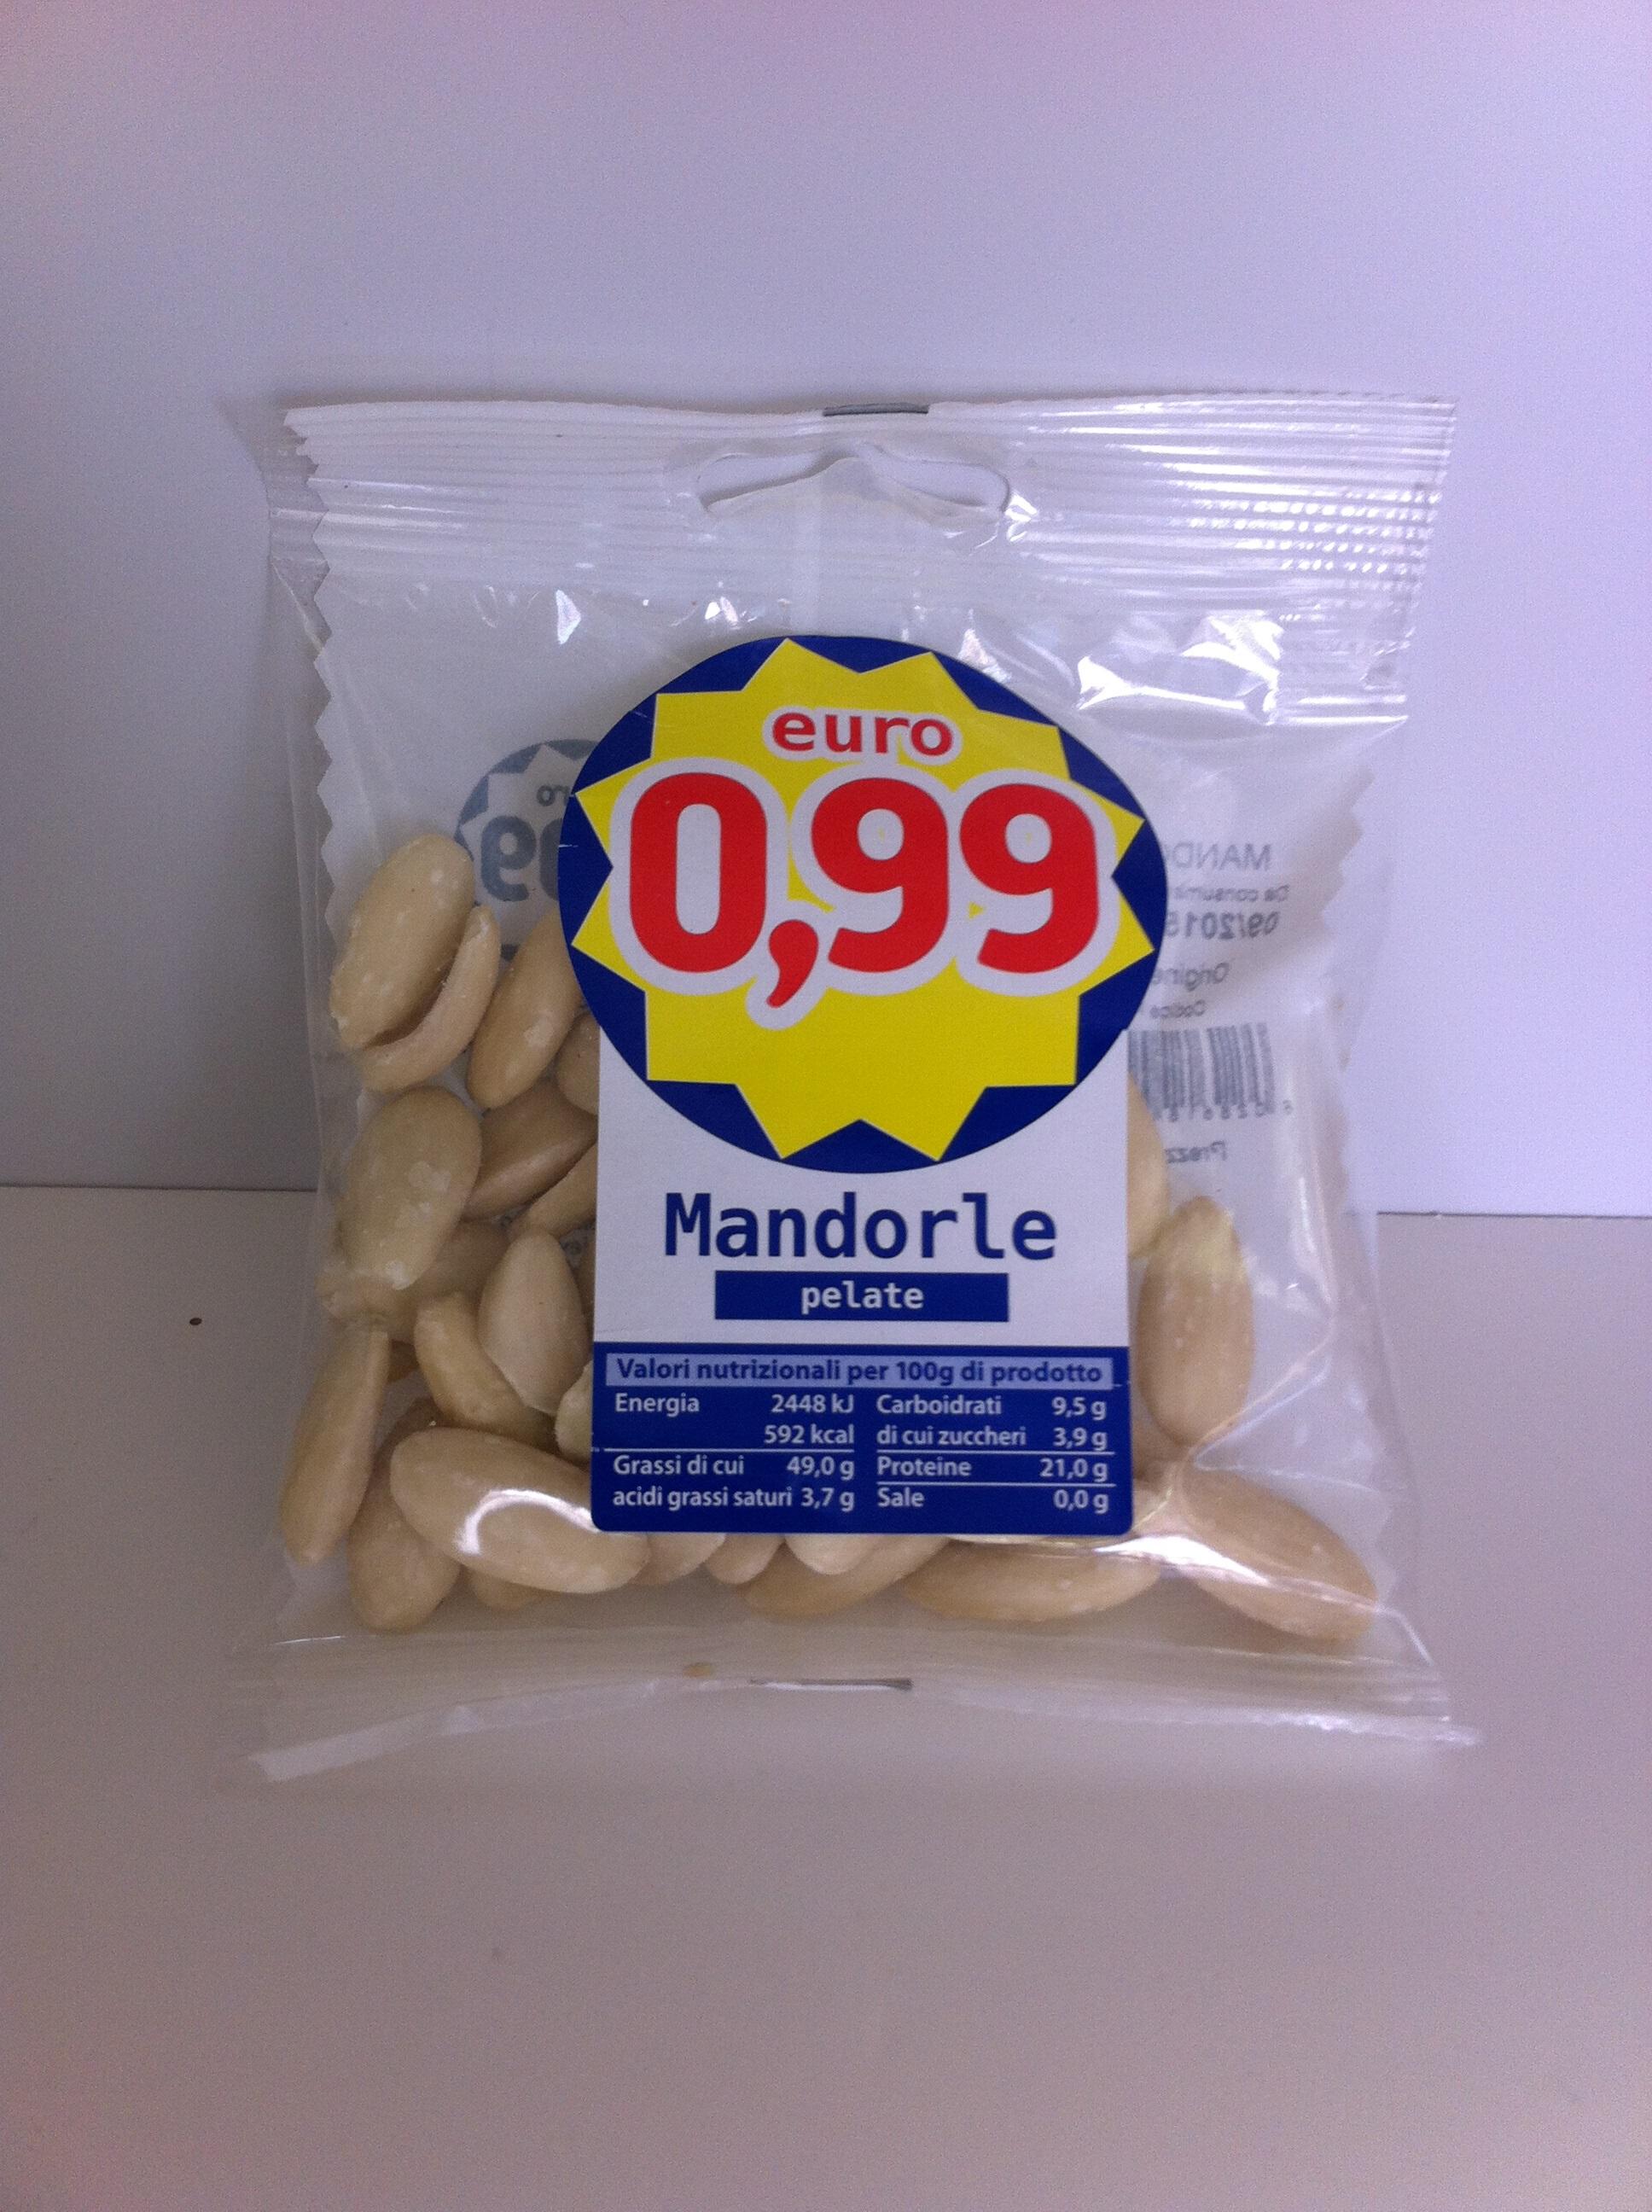 MANDORLE PELATE MADIVENTURA 50g